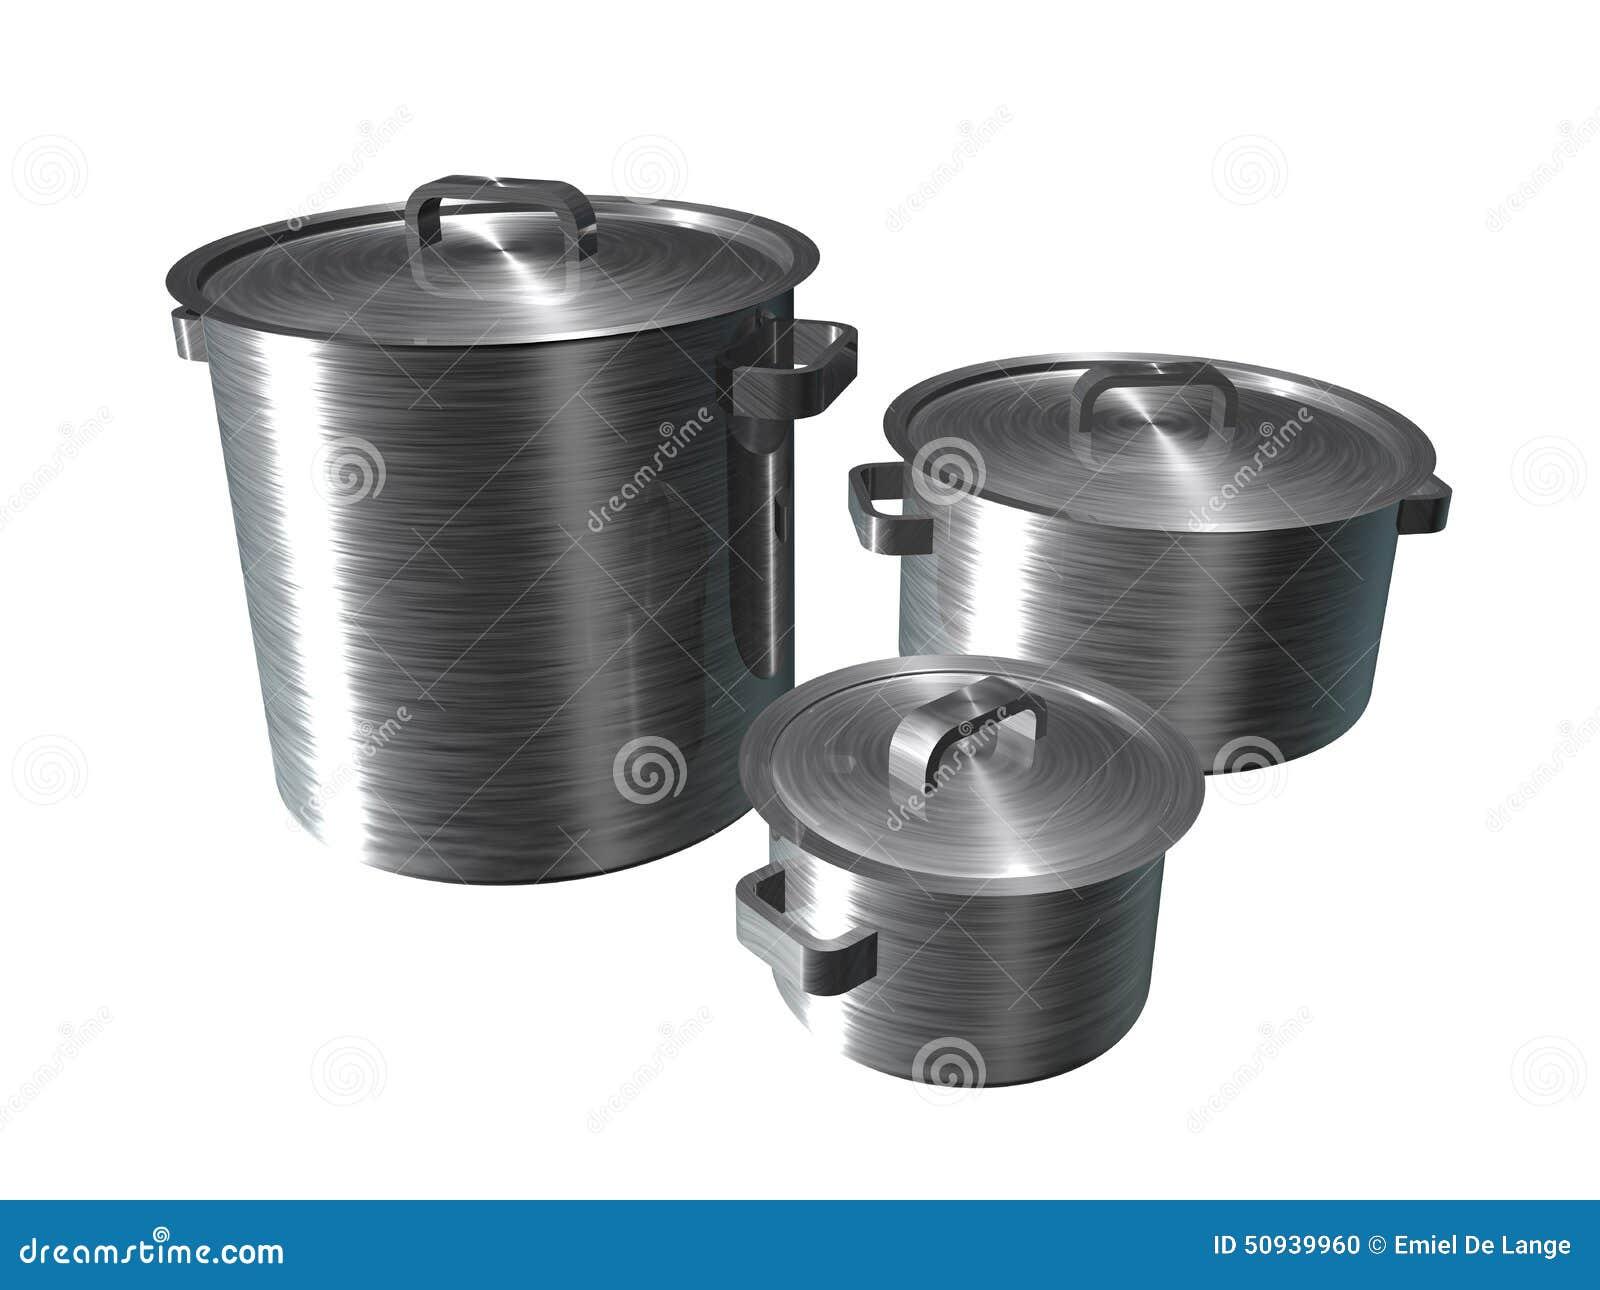 illustration of three stainless steel pans stock illustration image 50939960. Black Bedroom Furniture Sets. Home Design Ideas